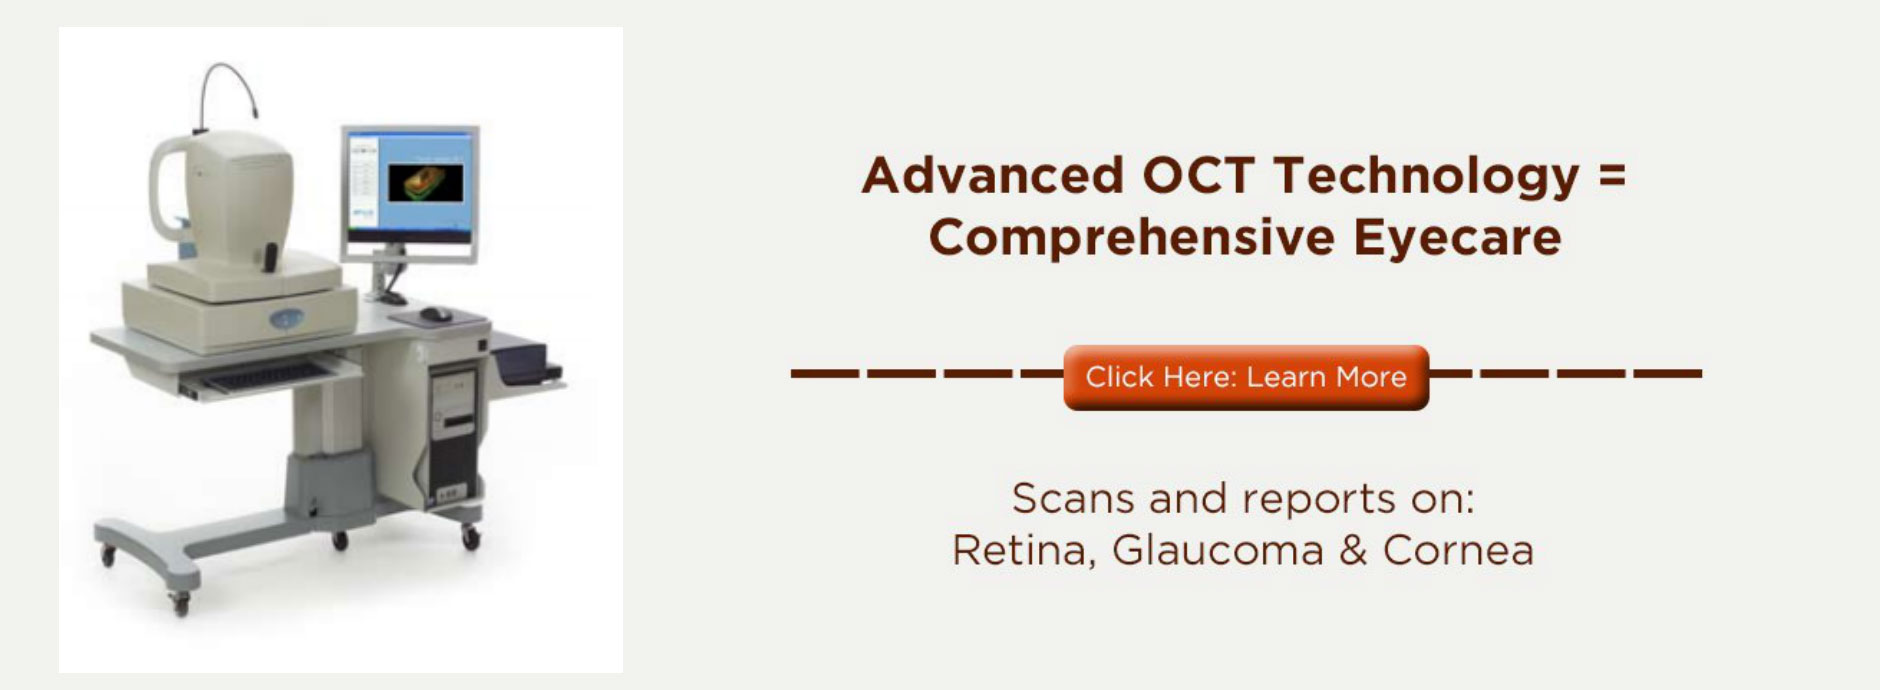 Advanced OCT Technology at Soto Eye Center in Sarasota, Florida